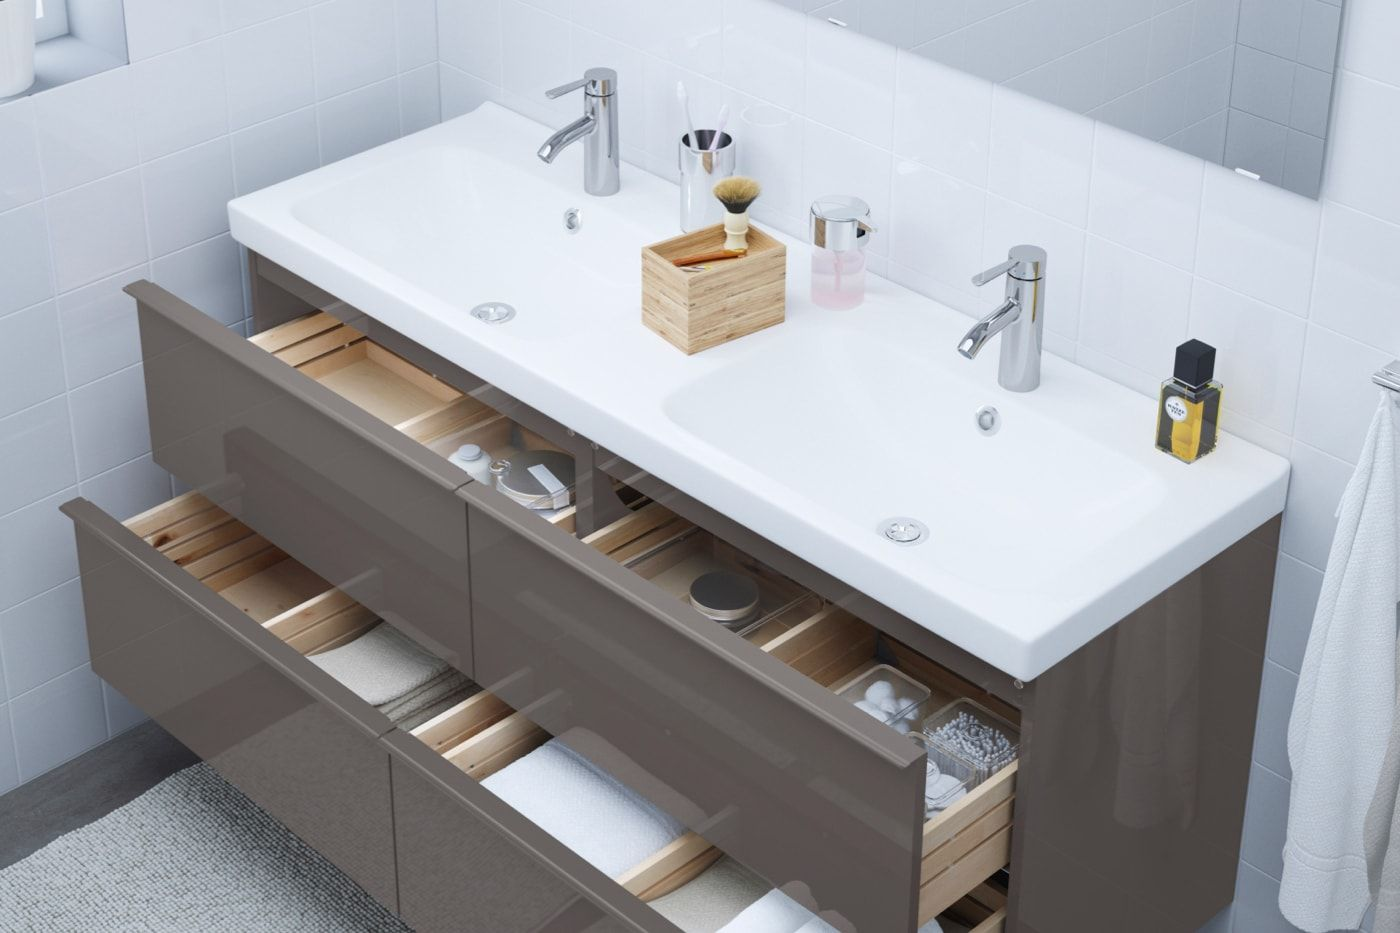 Ratgeber Welches Waschbecken Passt Zu Dir Badezimmer Ikea Badezimmer Waschbecken